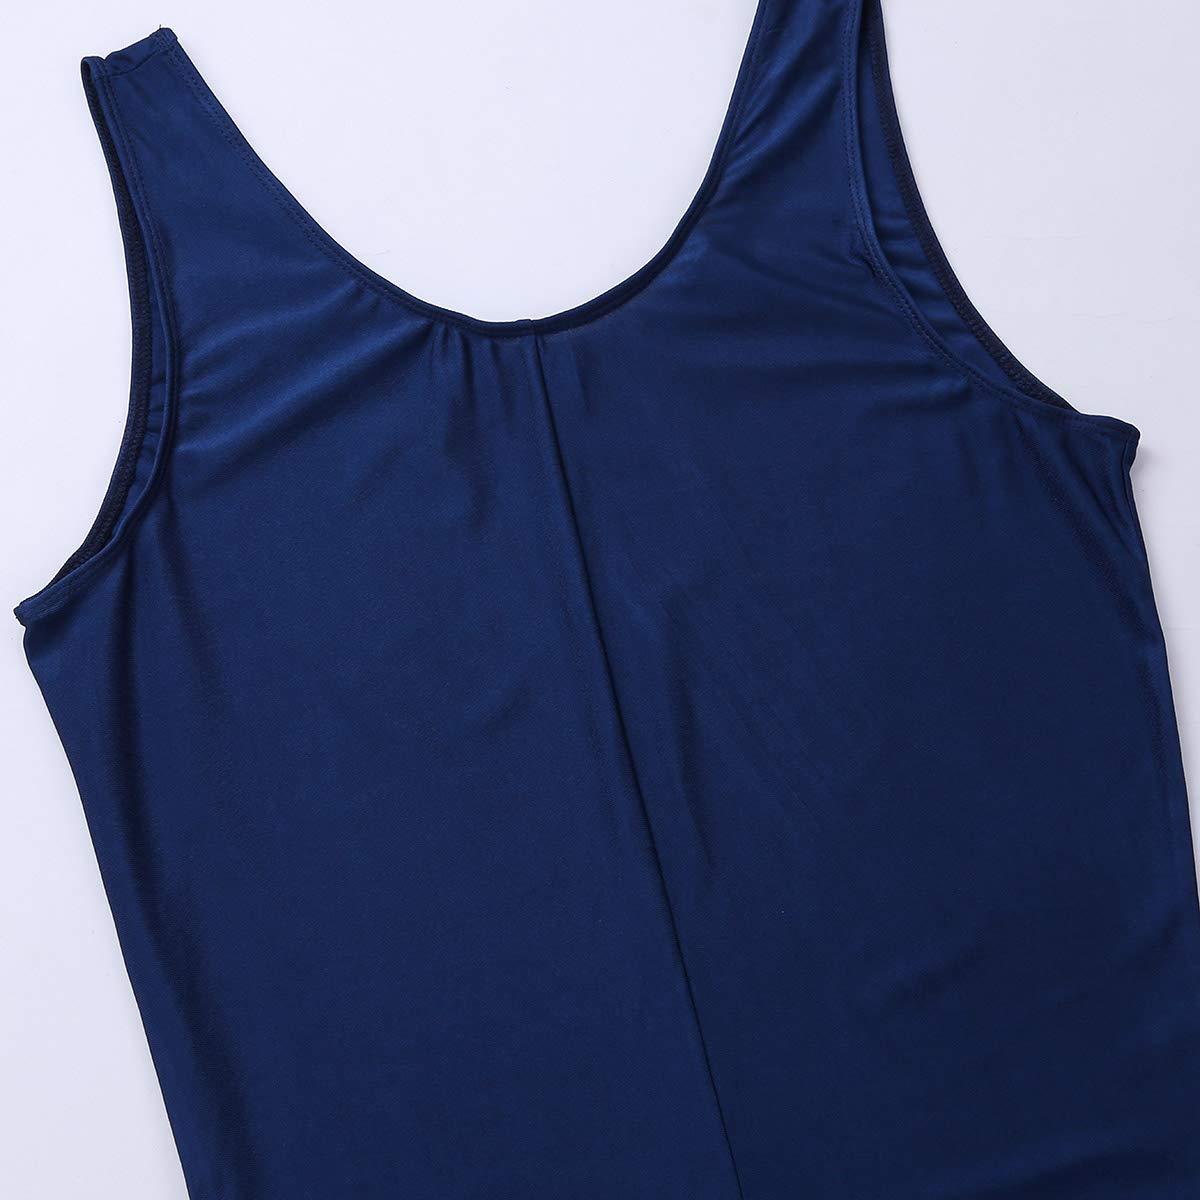 Freebily Mens Spandex One Piece Unitard Bodysuit Sleeveless Stretch Skin-Tight Leotard Dancewear